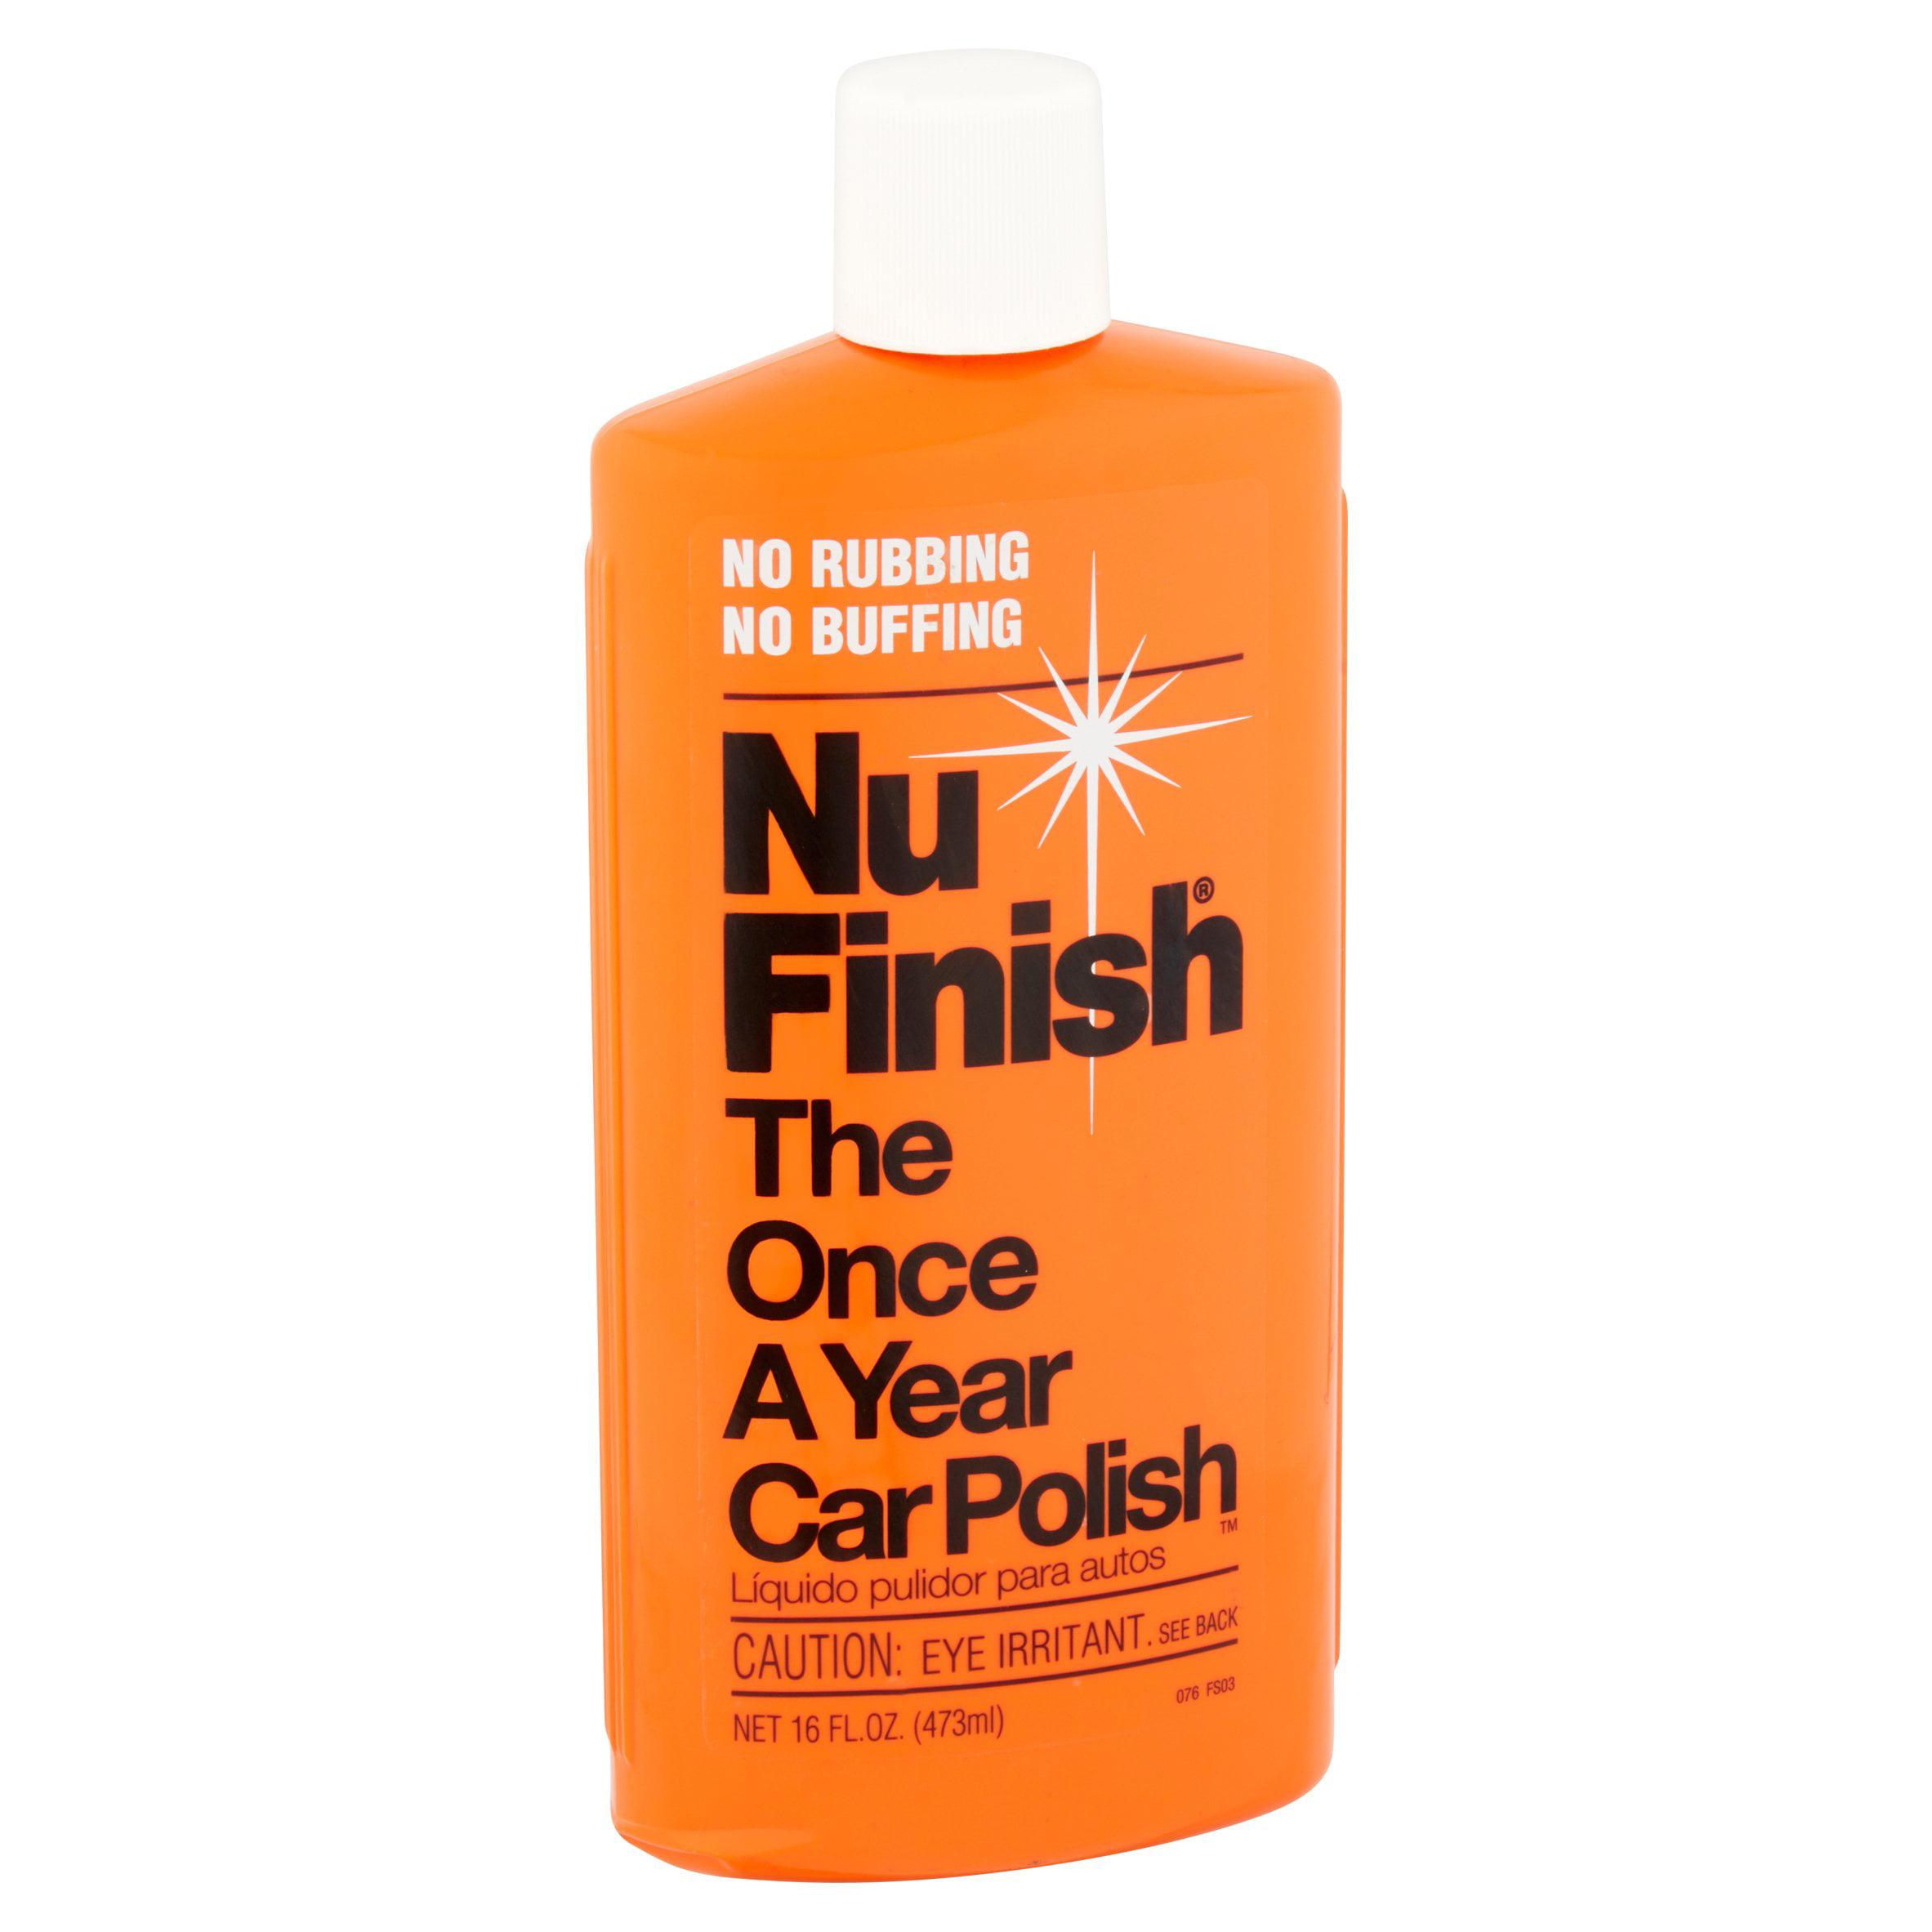 Nu Finish The Once A Year Car Polish, 16 fl oz